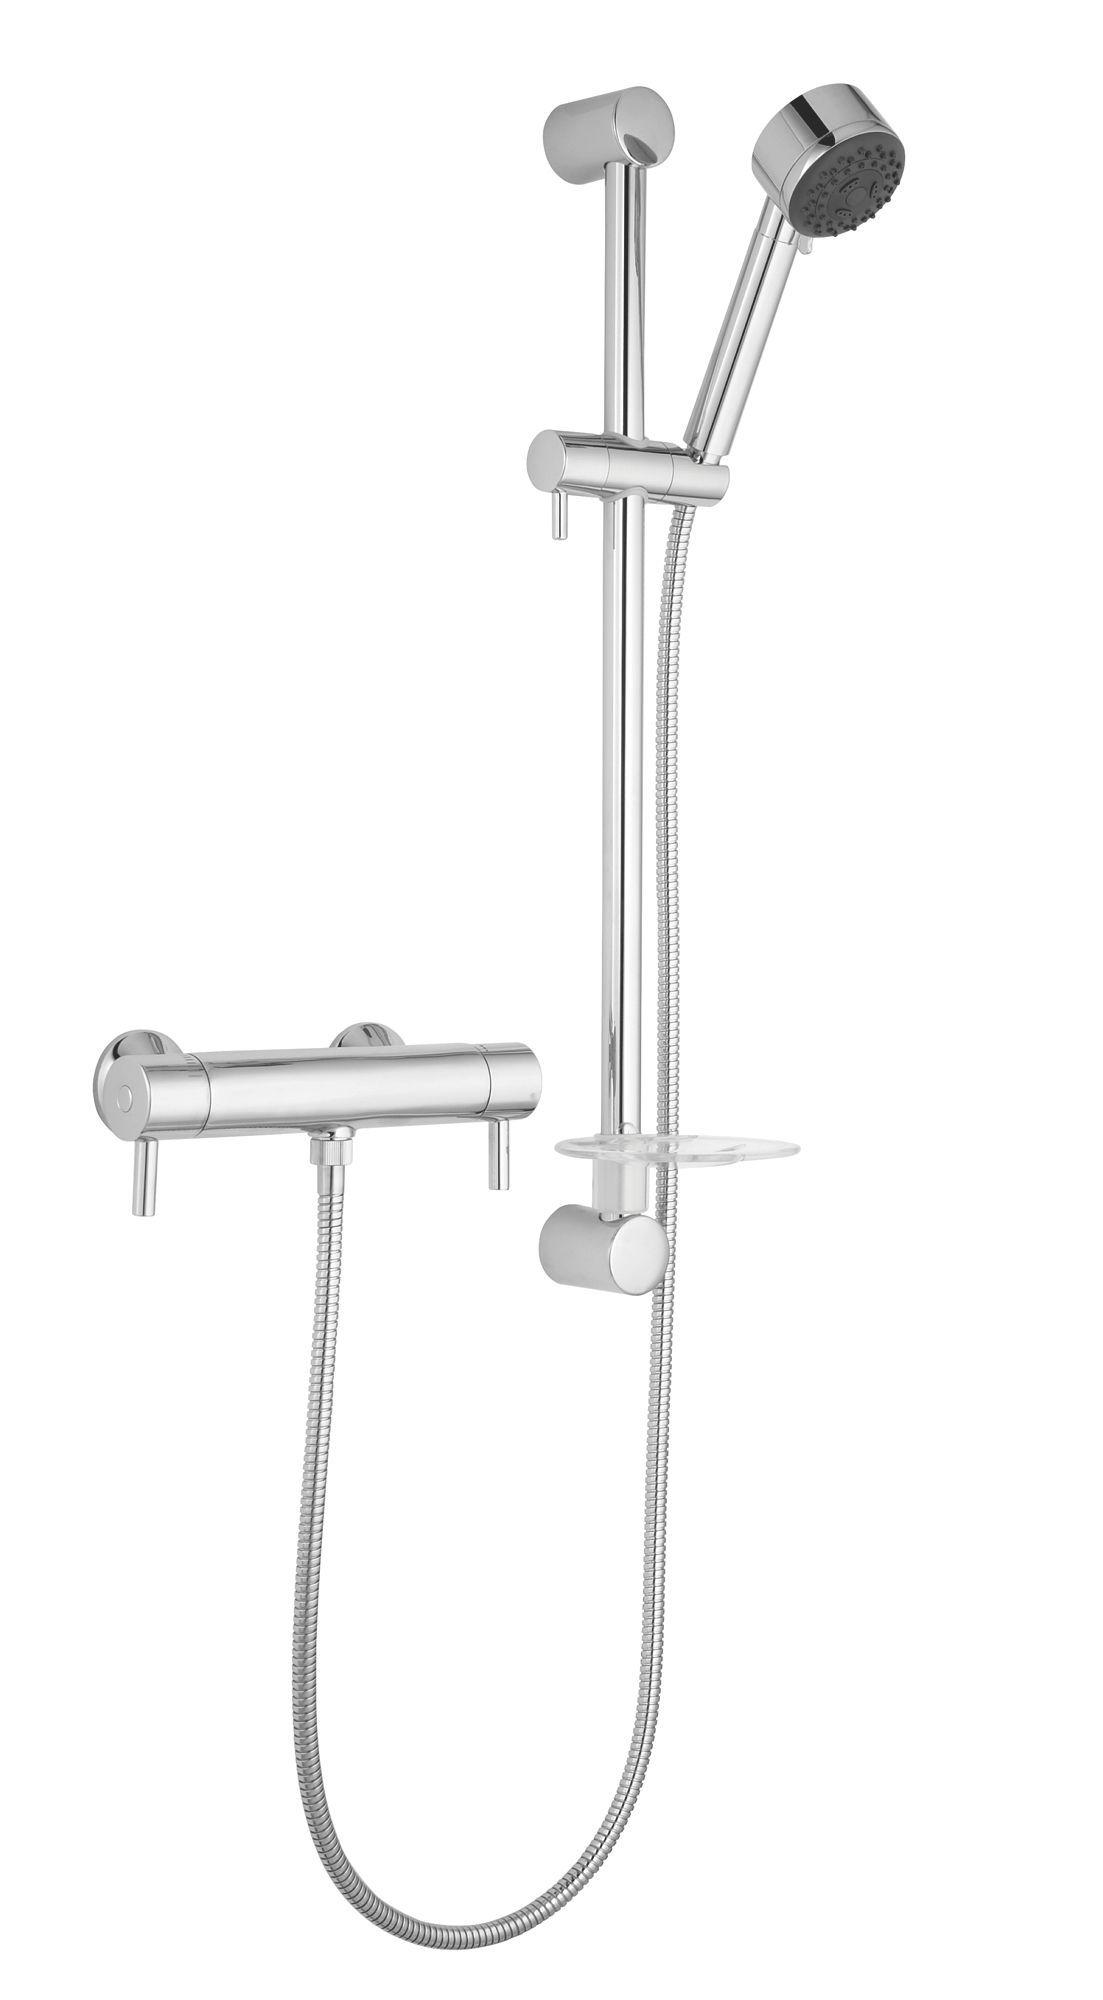 Cooke & Lewis Cirque Chrome Thermostatic Bar Mixer Shower